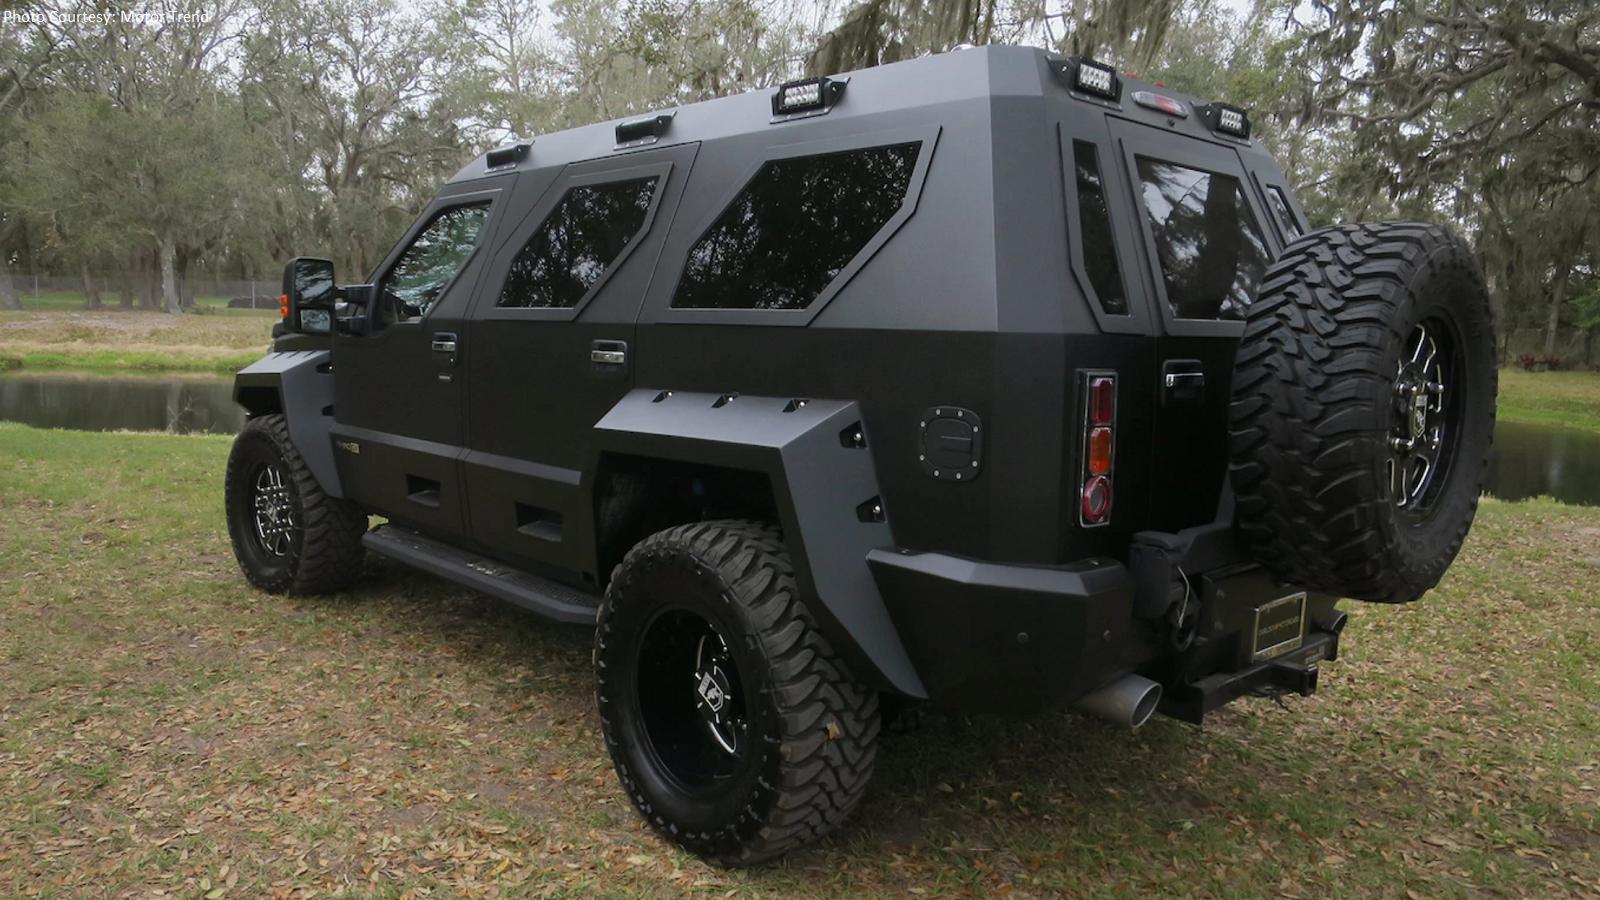 USSV Rhino GX is the F-450 Based Truck We Need